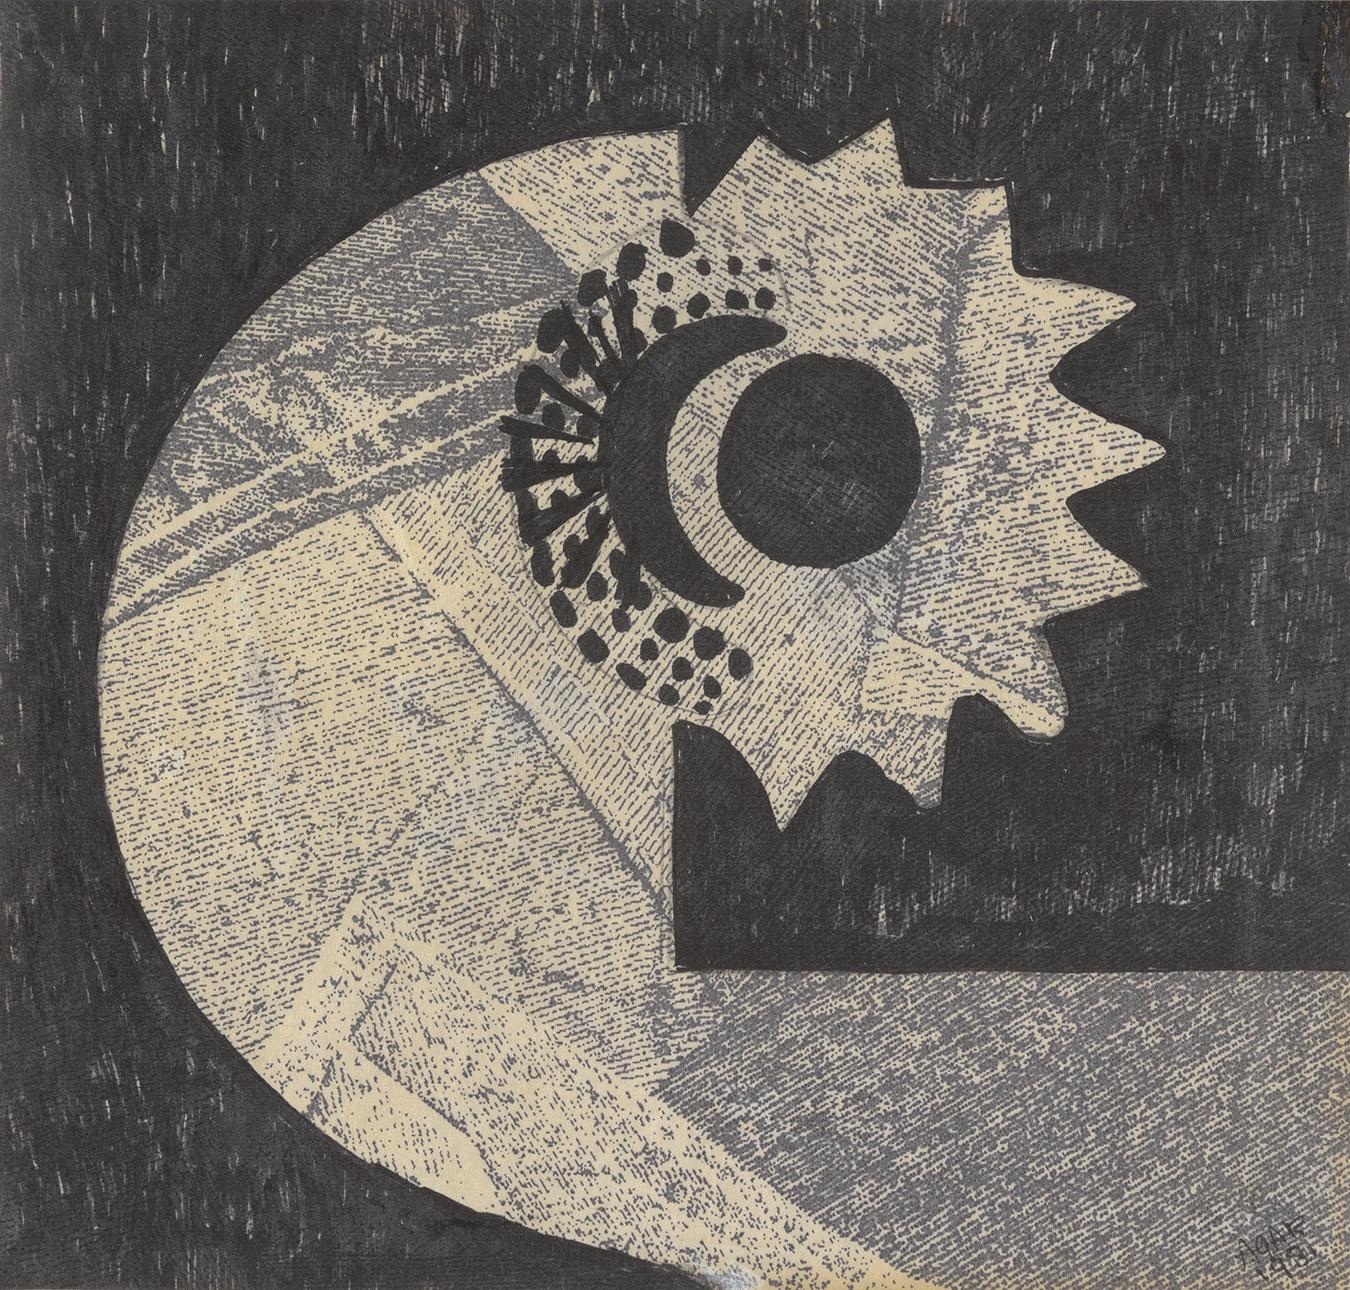 Eileen Agar, Black Flower, 1981, Ink on paper, The Petter Collymore Gift (2016) © Estate of Eileen Agar